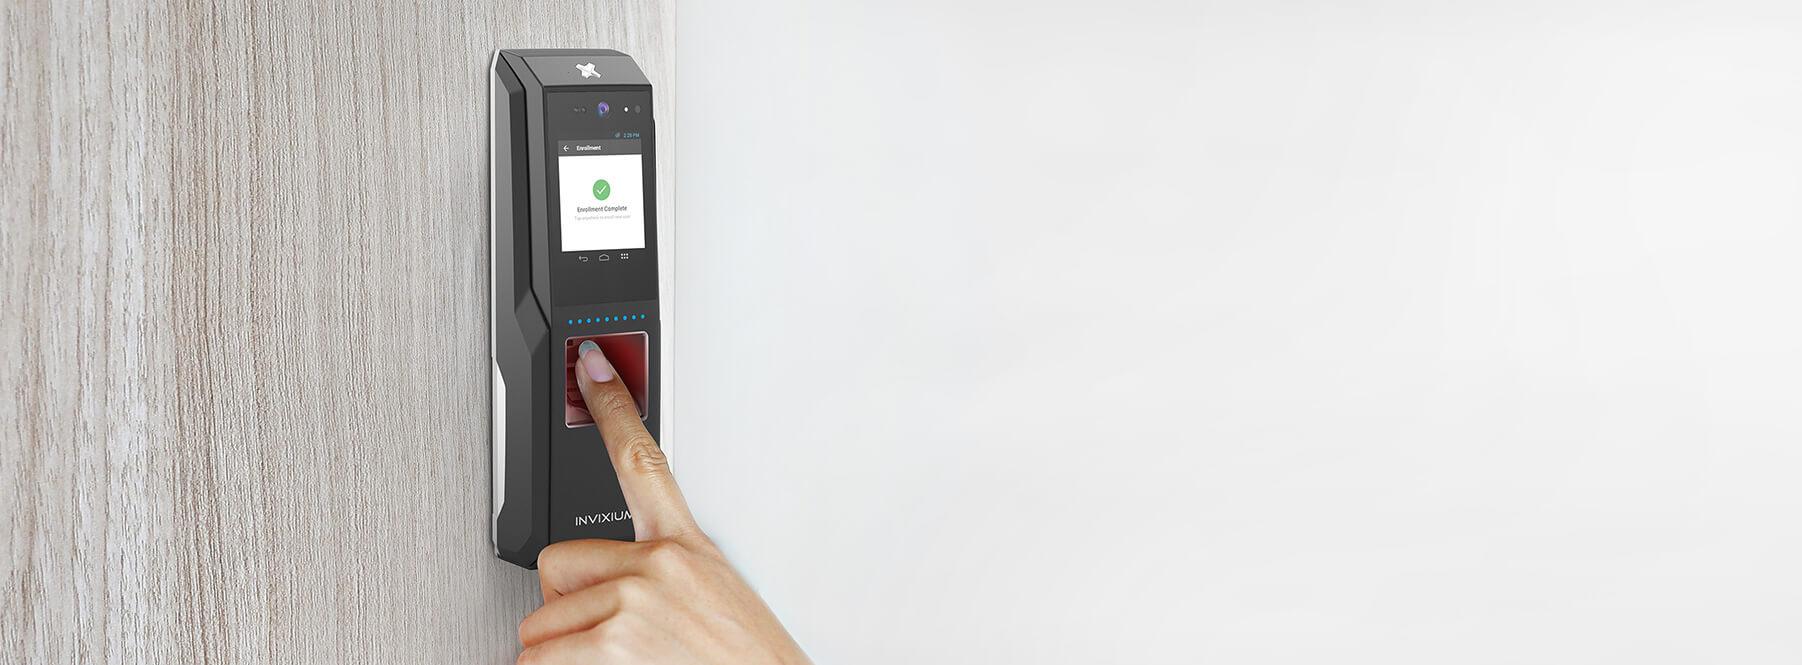 Fingerprint Biometrics Security